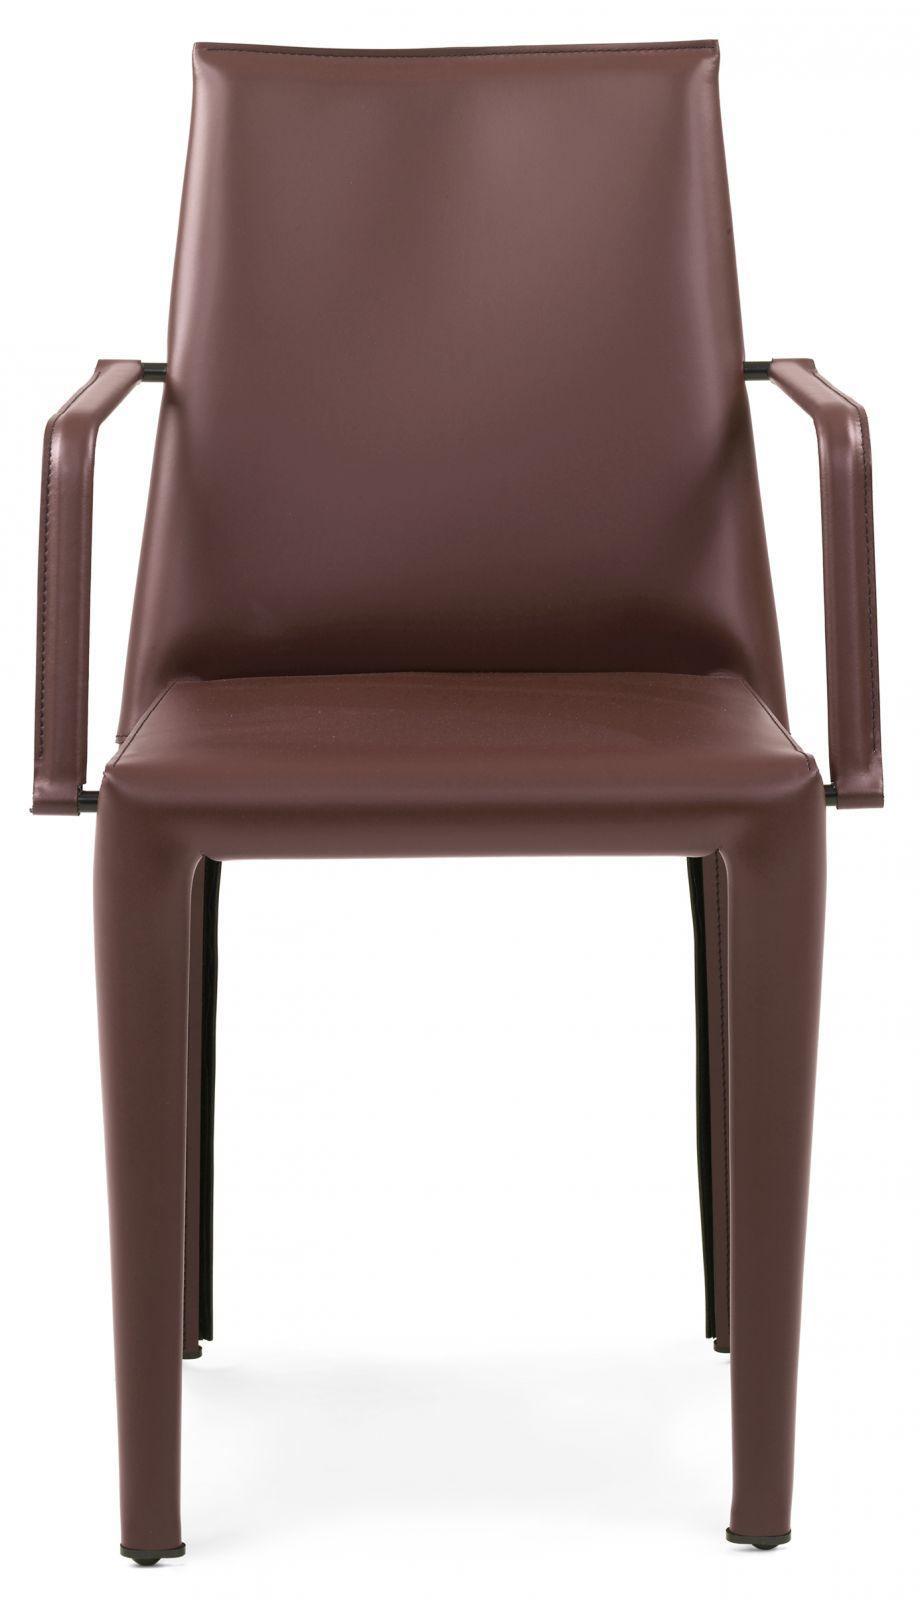 modern-office-furniture-chairs-Italian-designer-furniture (22).jpg